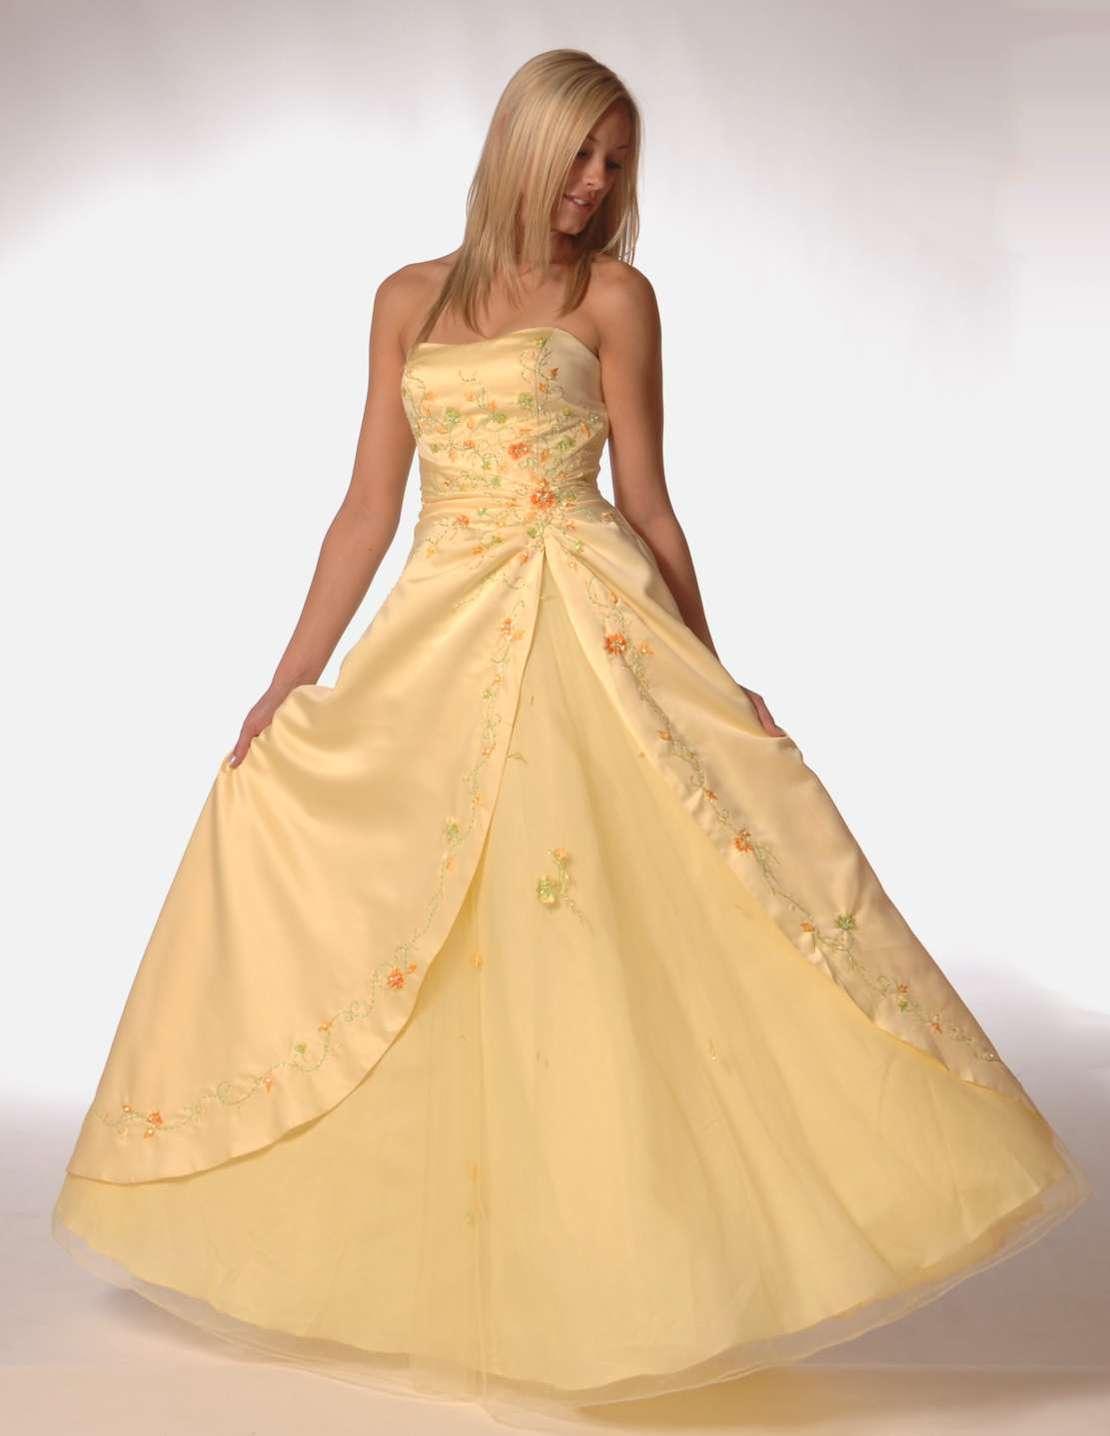 Pretty Girls in Prom Dresses